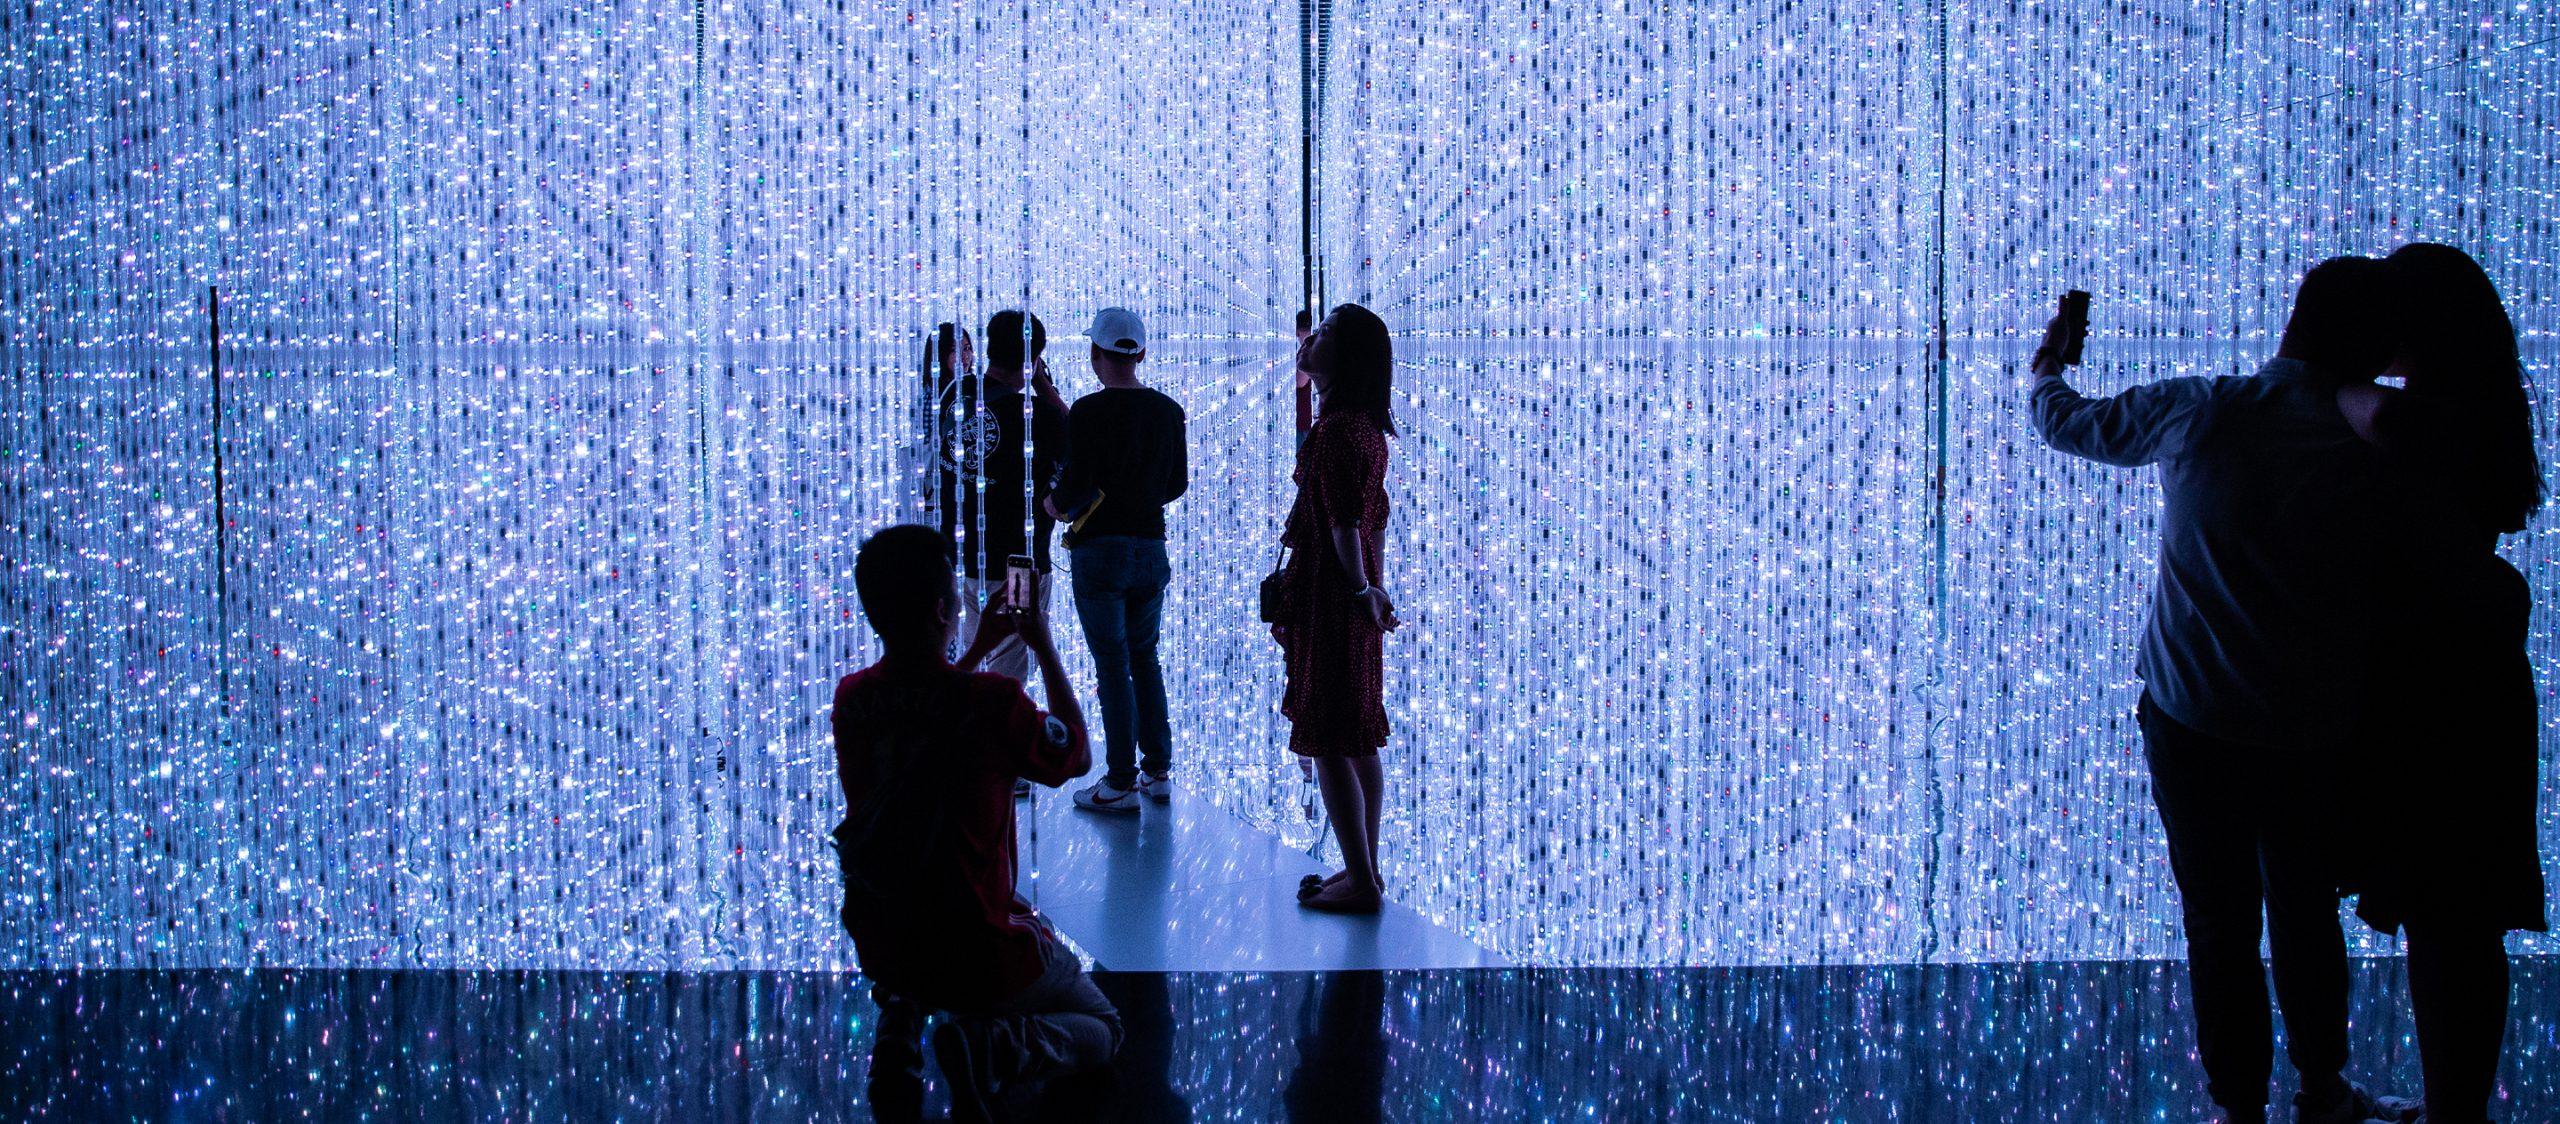 Singapore Art Trail : 10 จุดอาร์ตน่าไปที่คุณอาจไม่เคยรู้ว่ามีอยู่ในสิงคโปร์